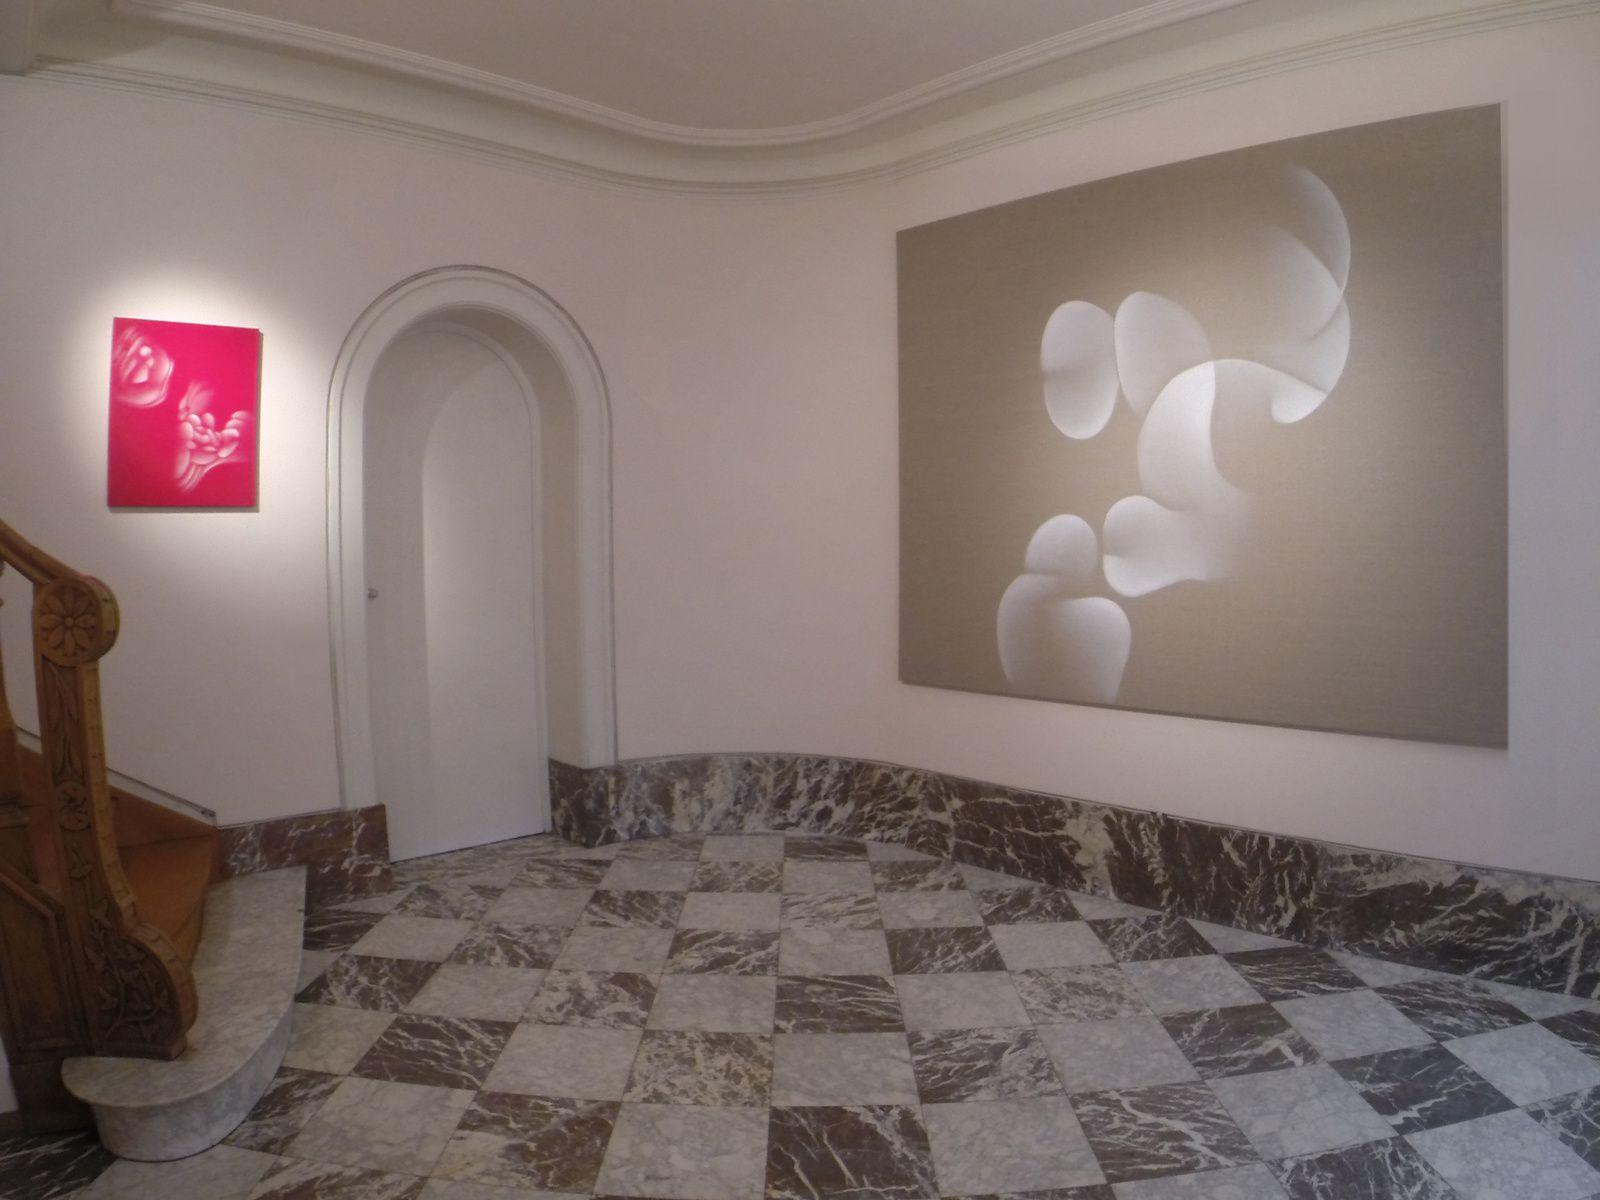 Guillaume Bottazzi solo show / Artiscope Gallery